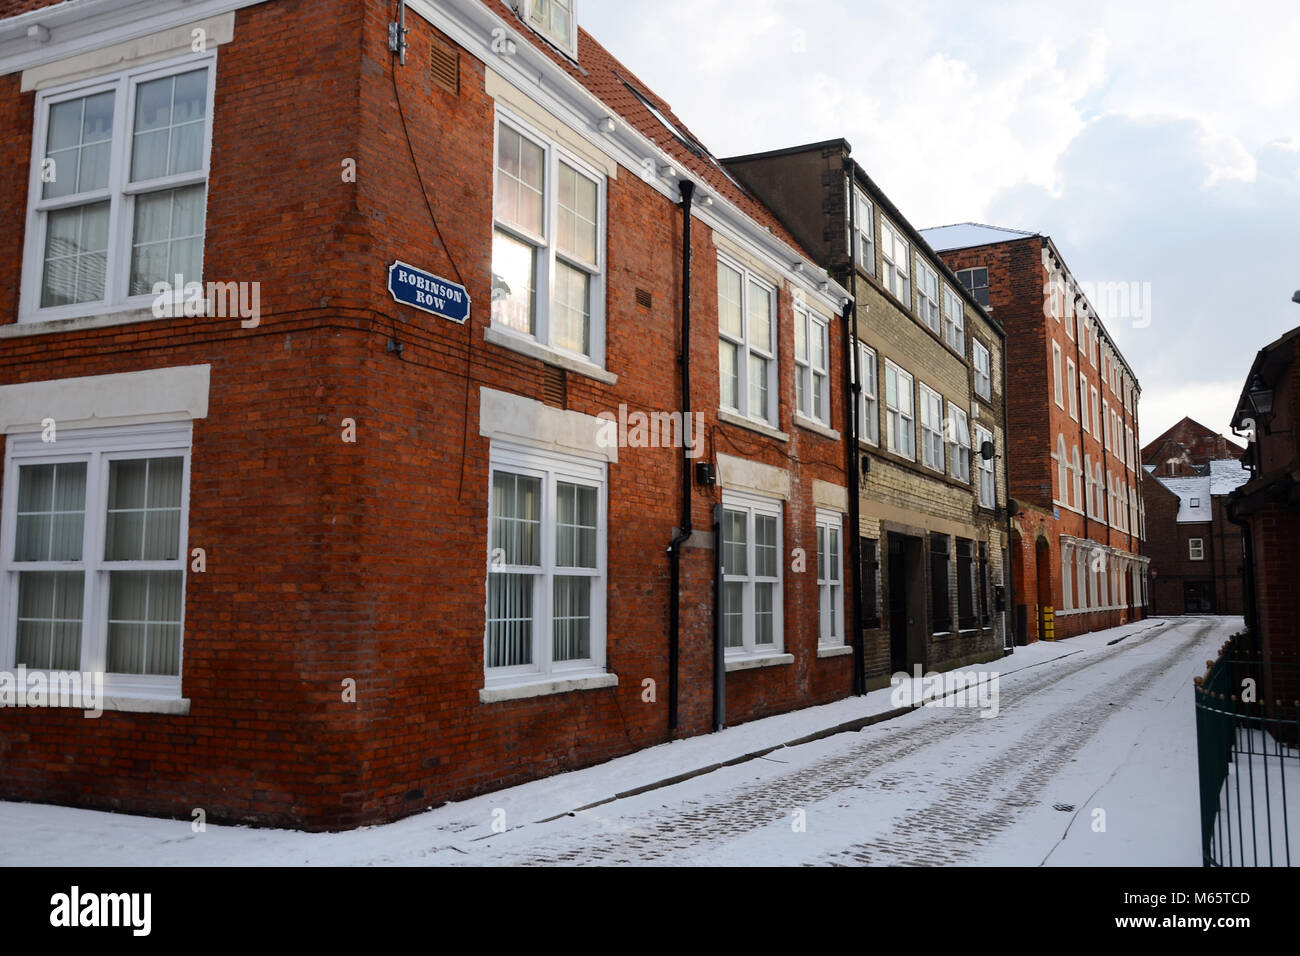 Robinson Row, Dagger Lane, old town, kingston upon Hull, Hull, UK - Stock Image